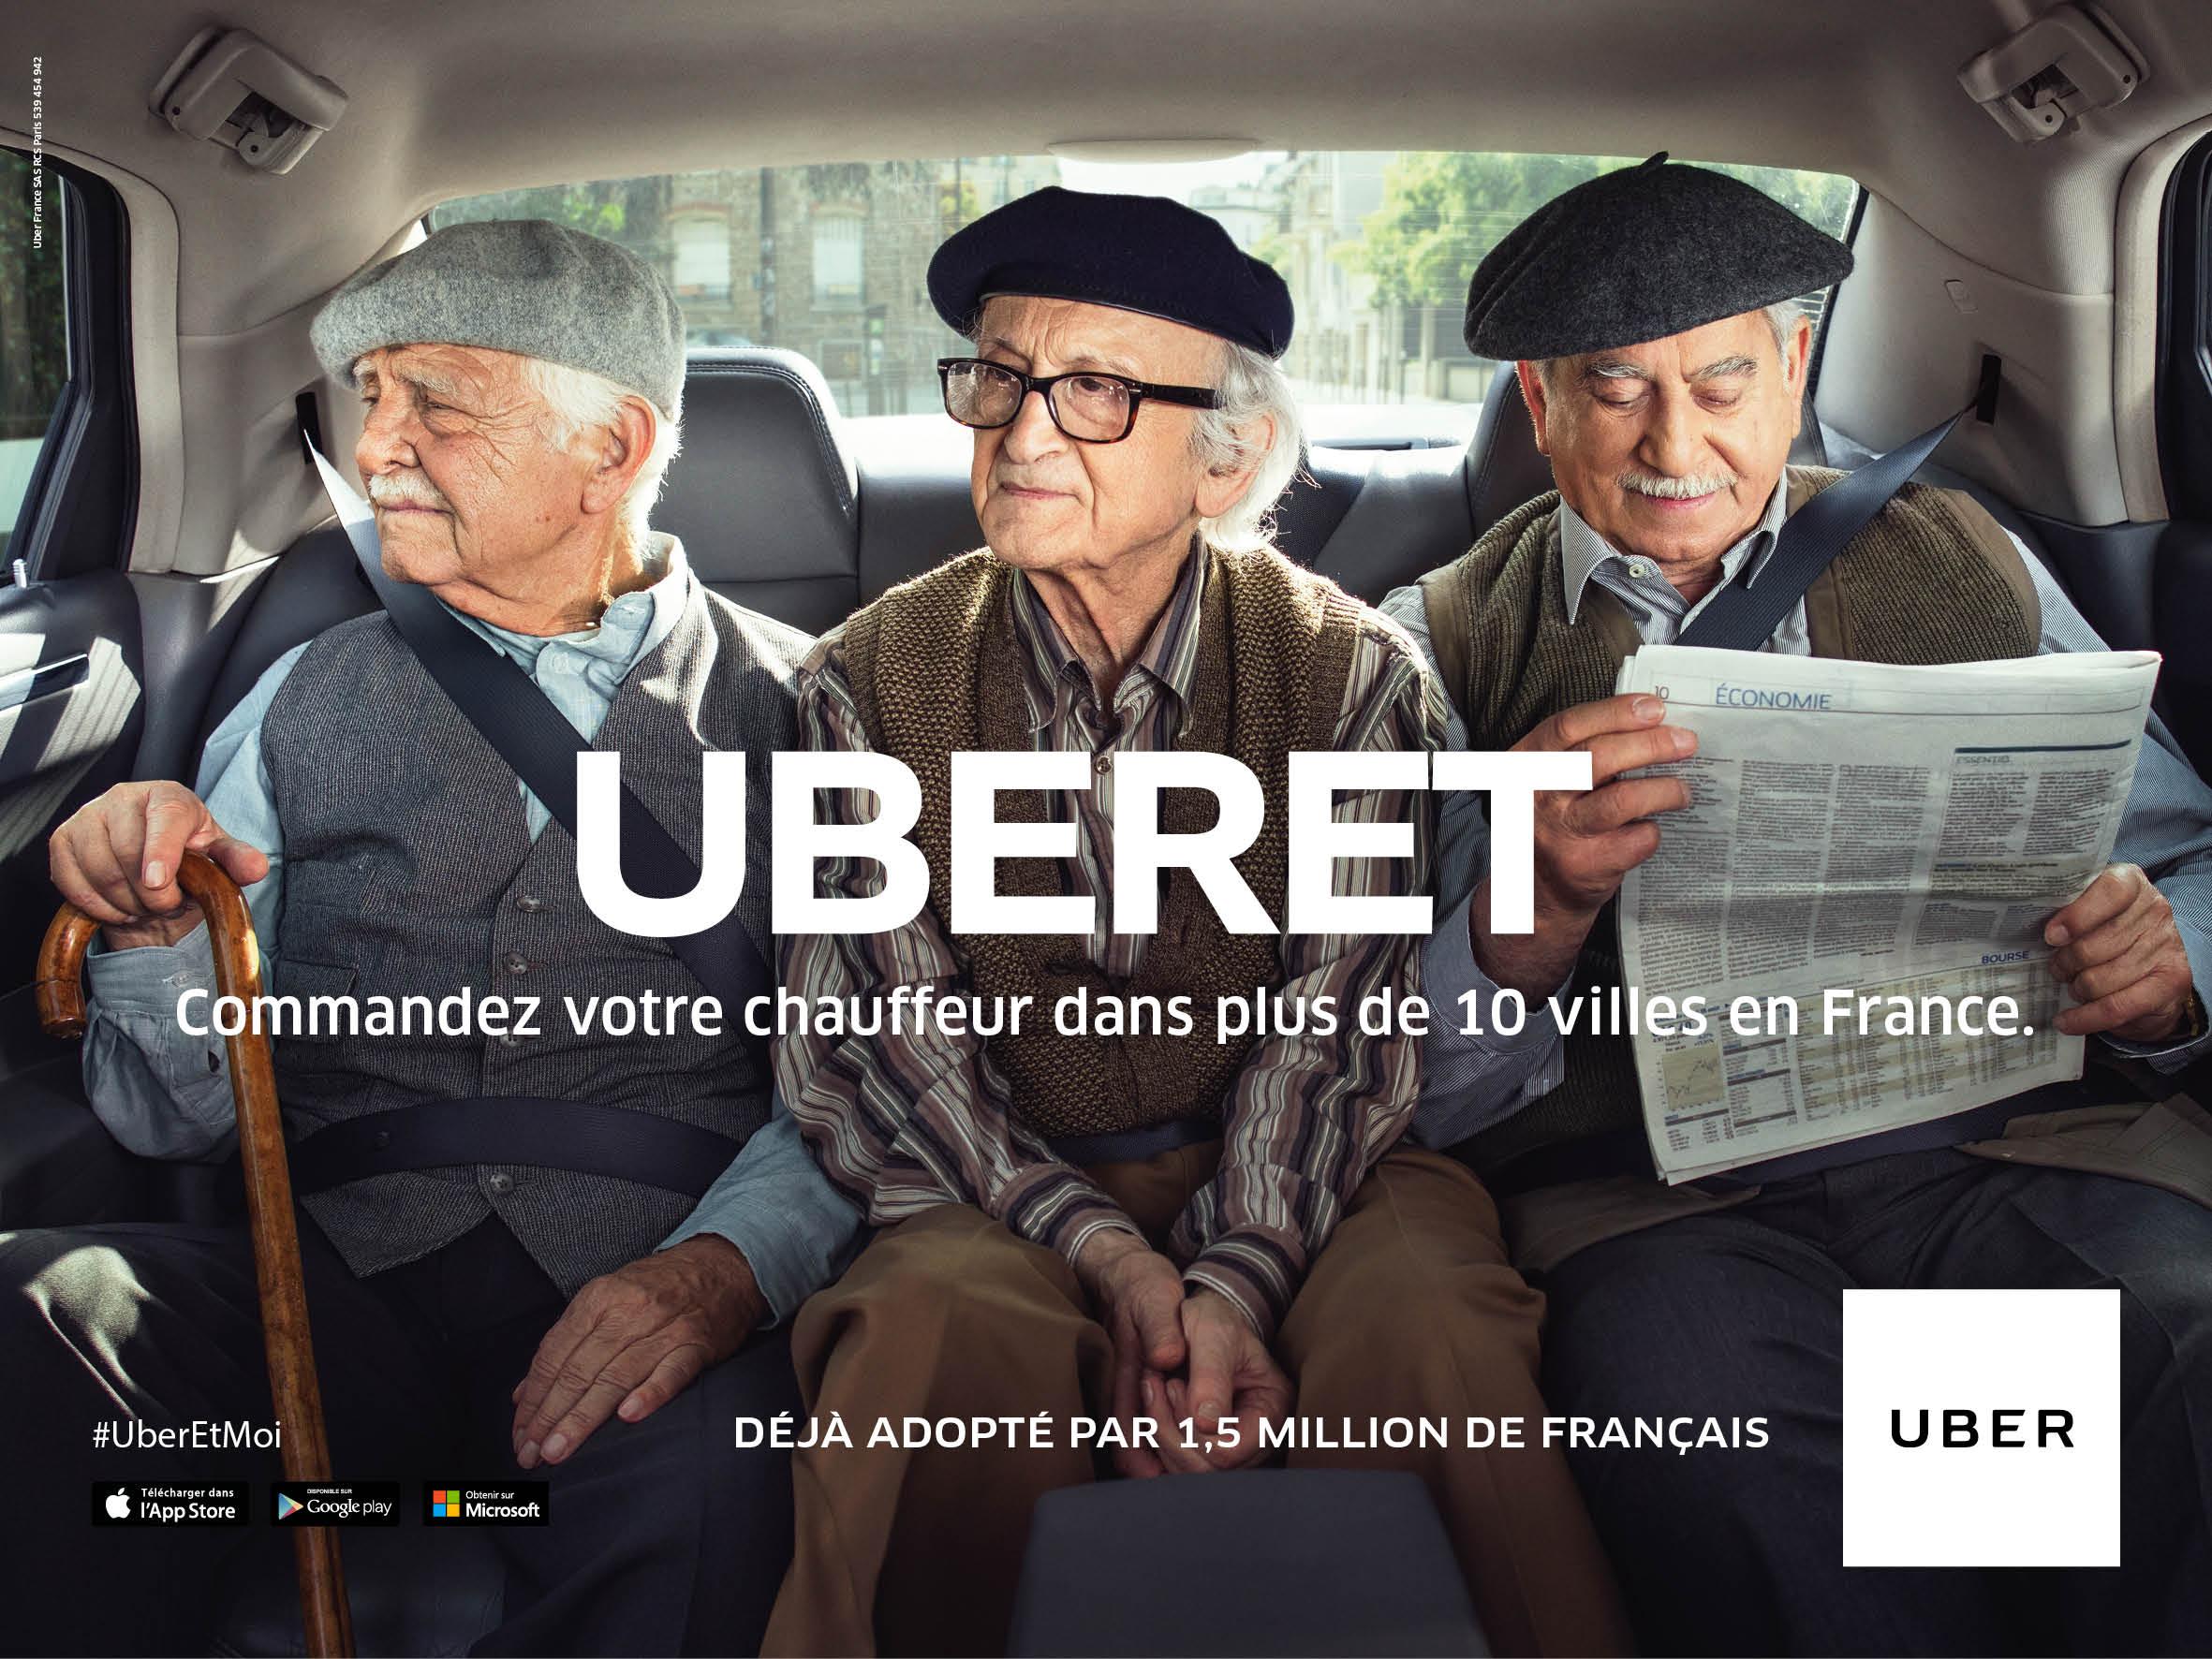 uber-france-publicite-marketing-application-utilisateurs-passagers-mars-2016-agence-marcel-publicis-3